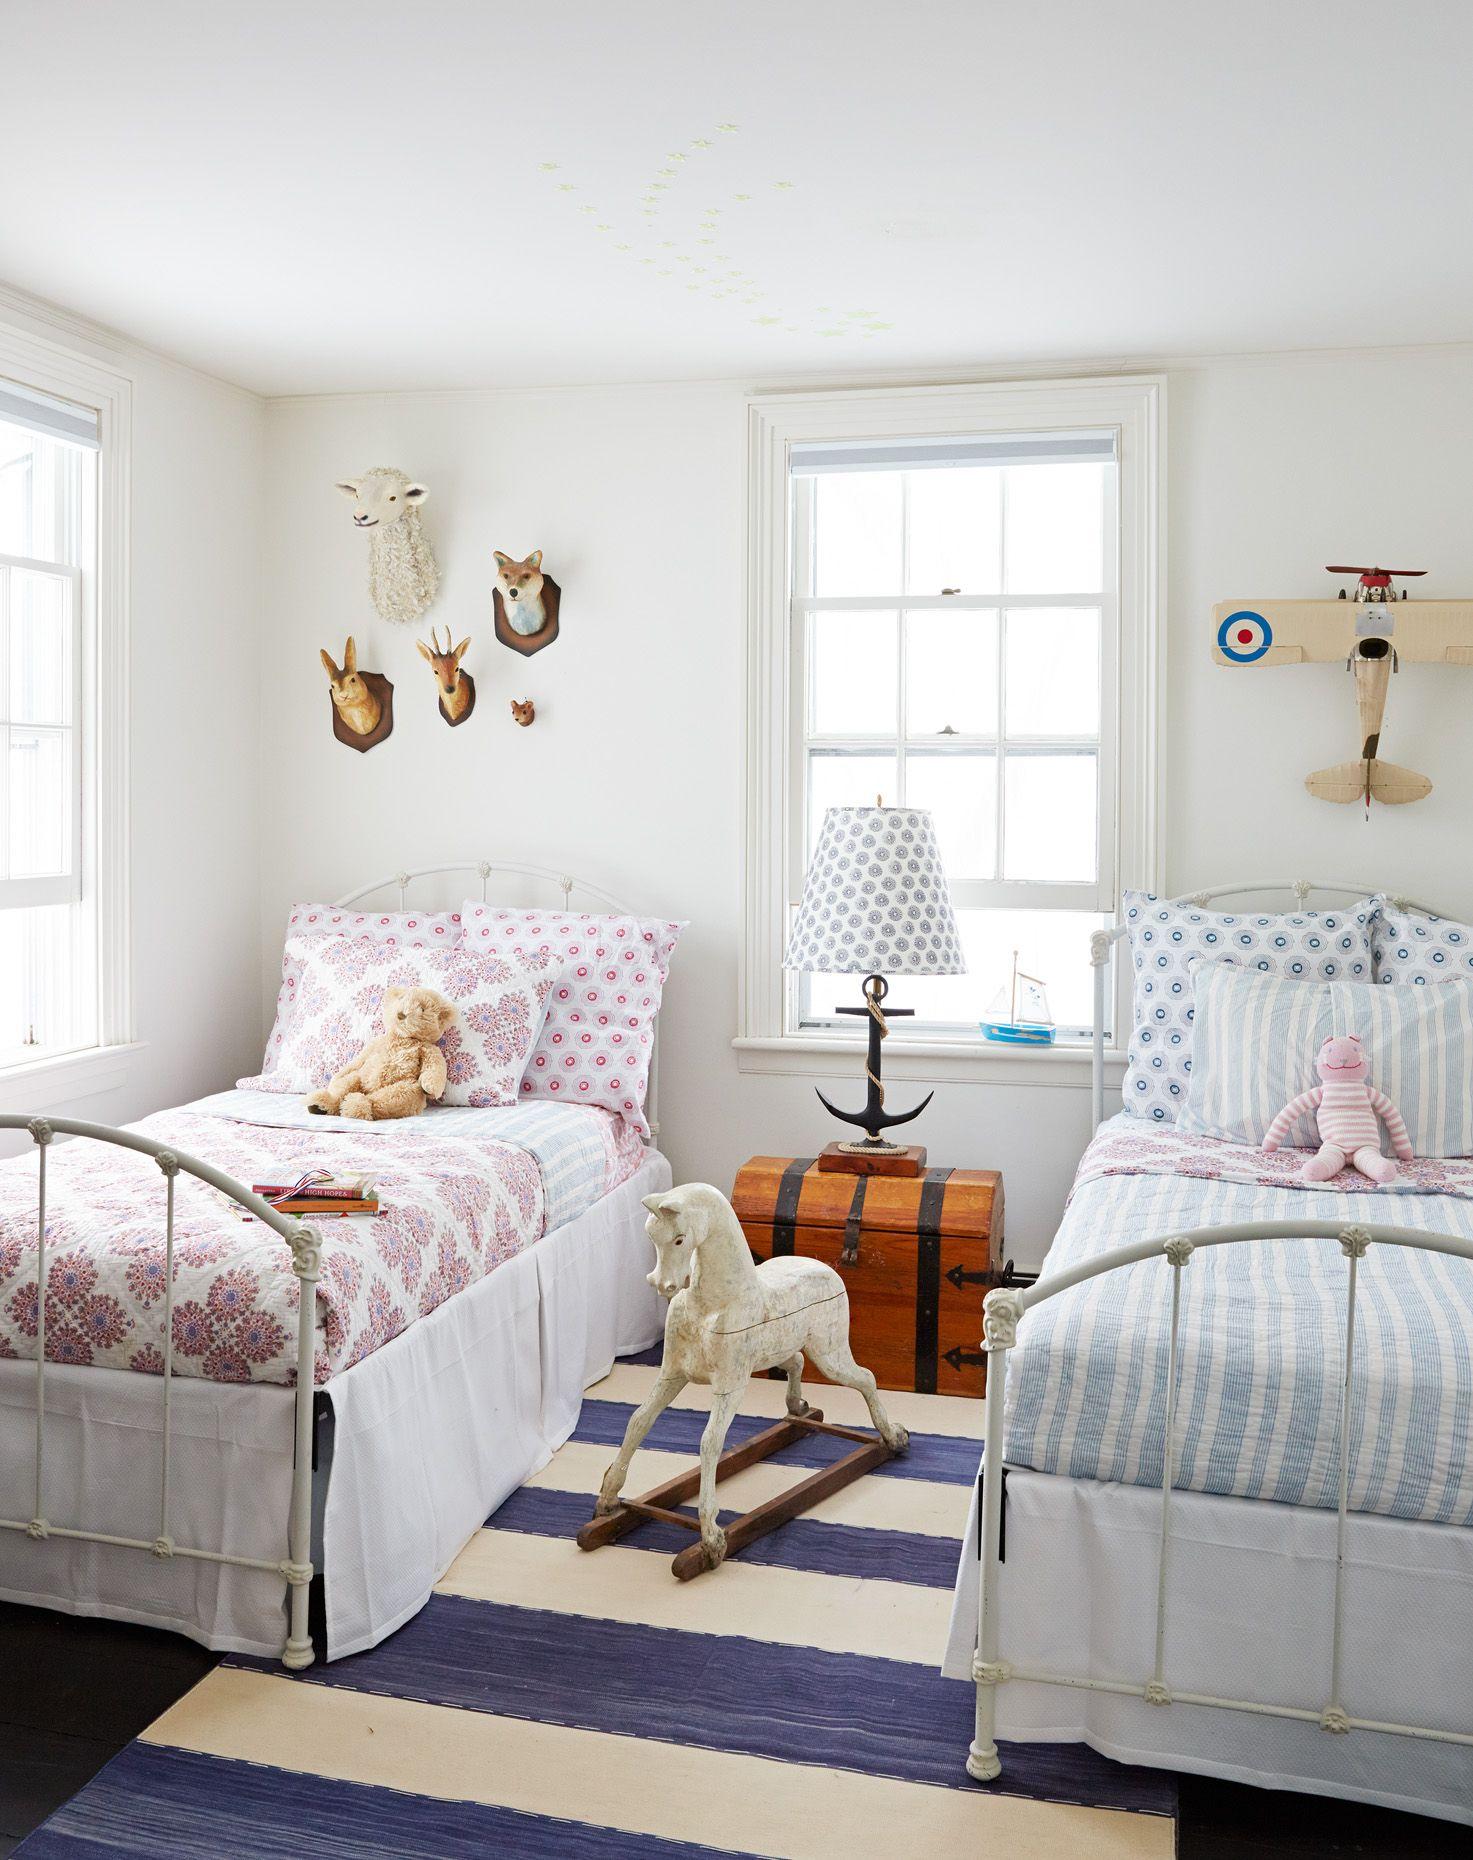 Best Twin Beds David A Land Photography Decor Kid Room Decor 400 x 300